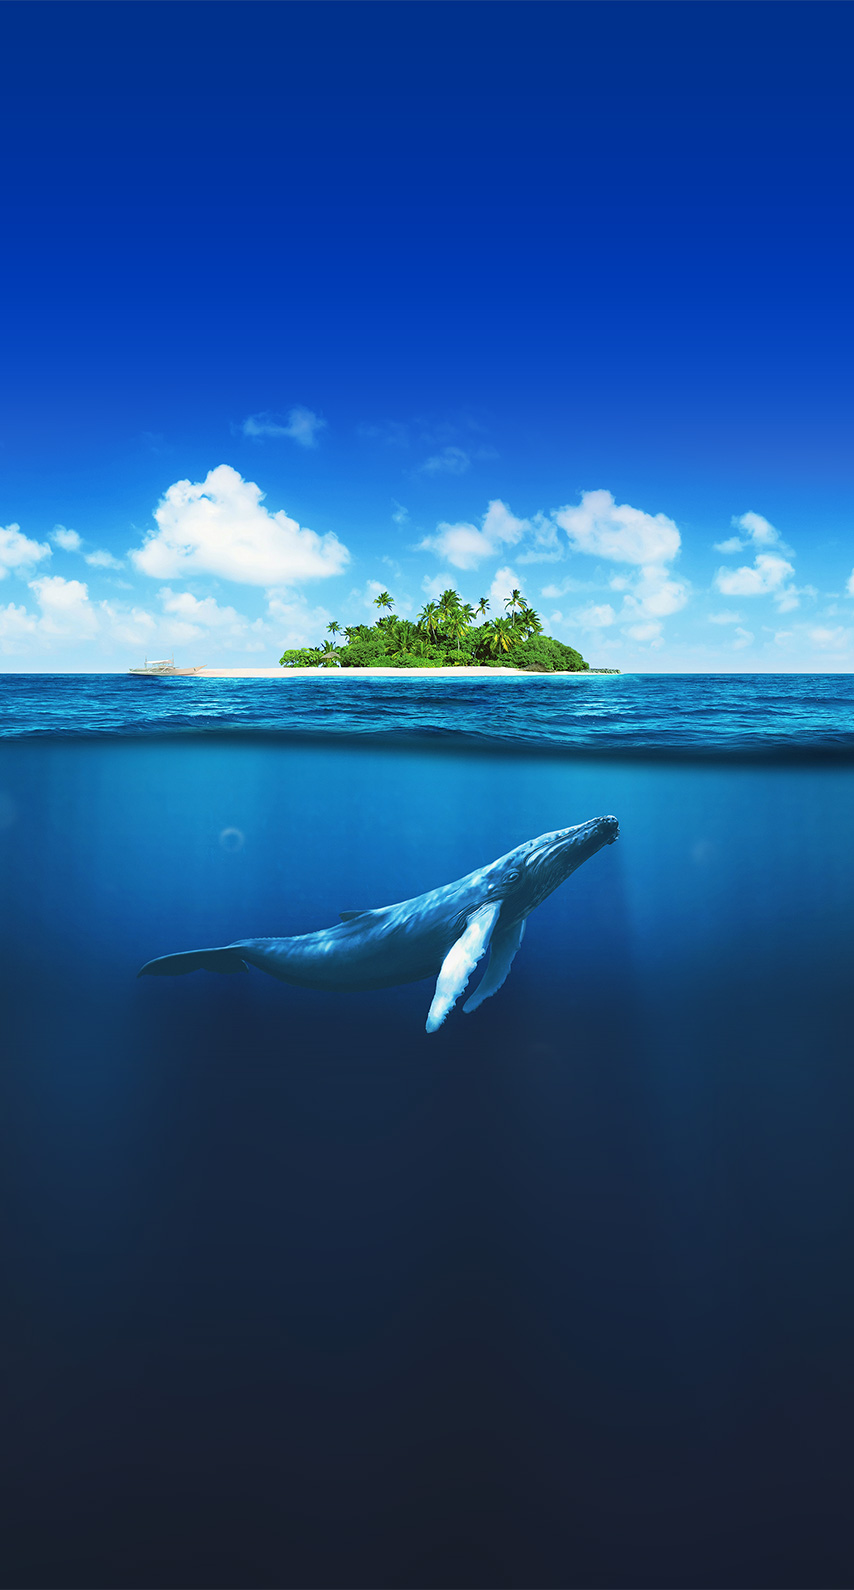 underwater, seascape